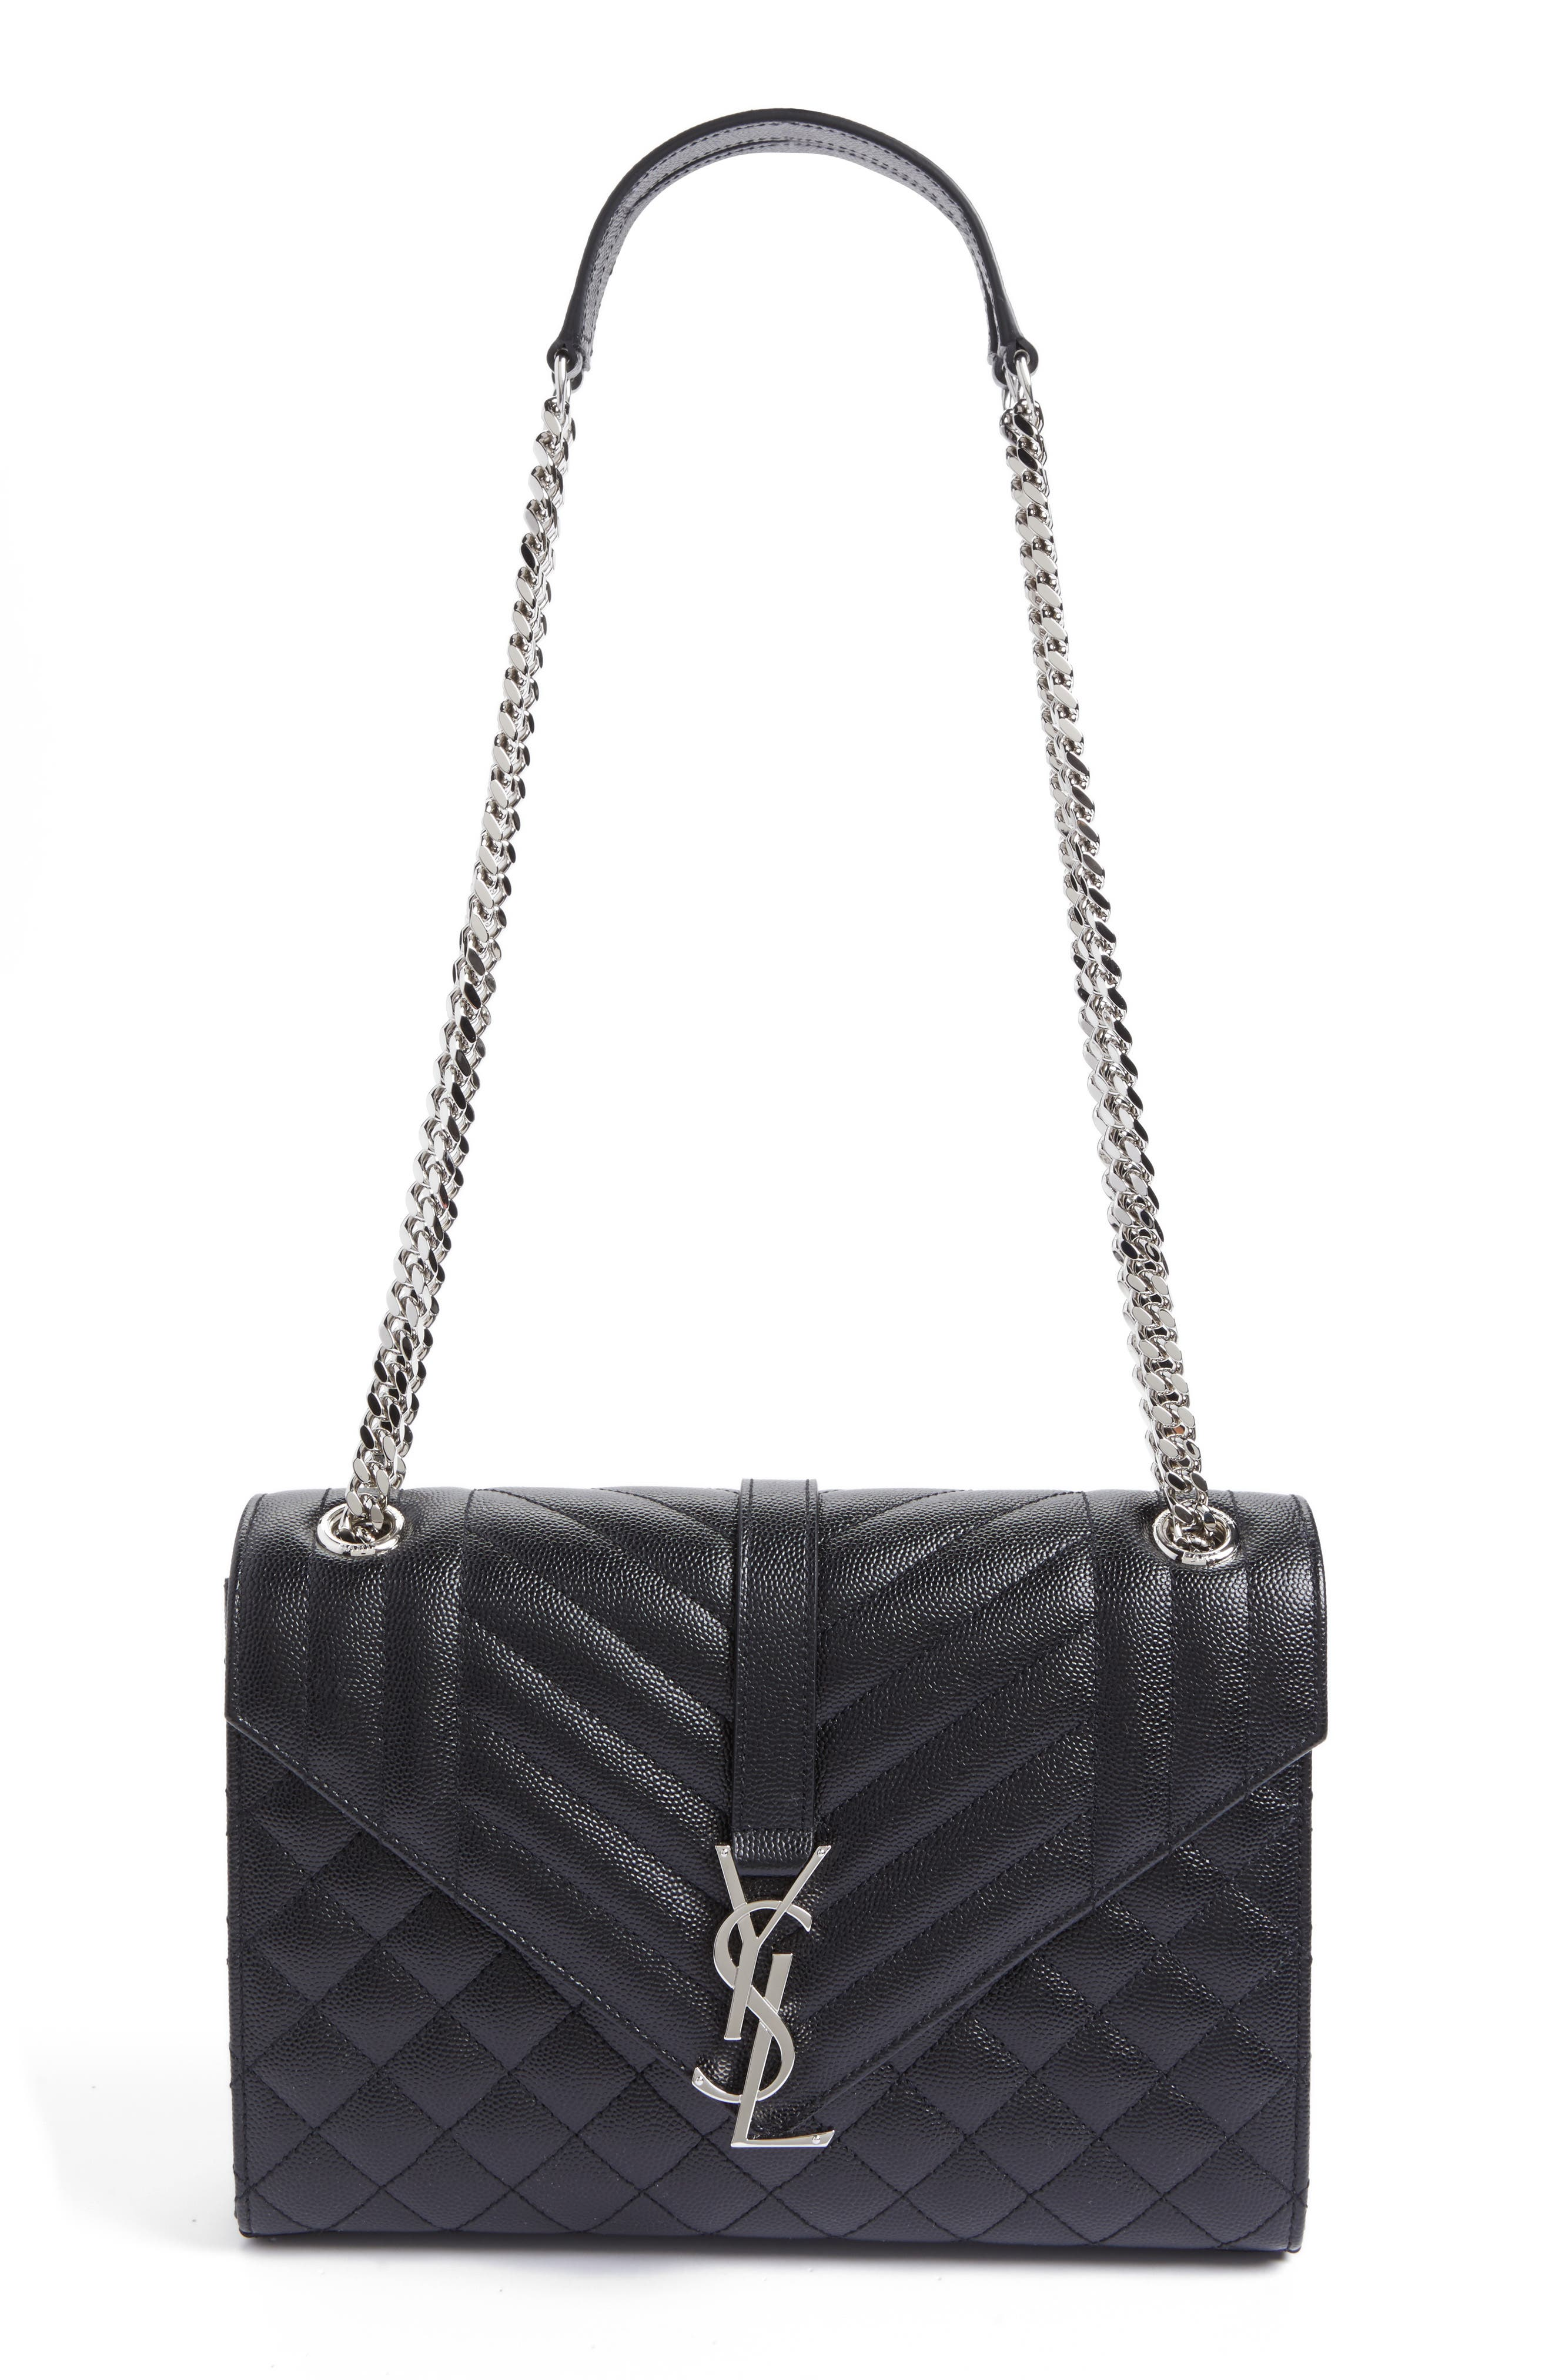 Main Image - Saint Laurent Medium Monogram Quilted Leather Shoulder Bag